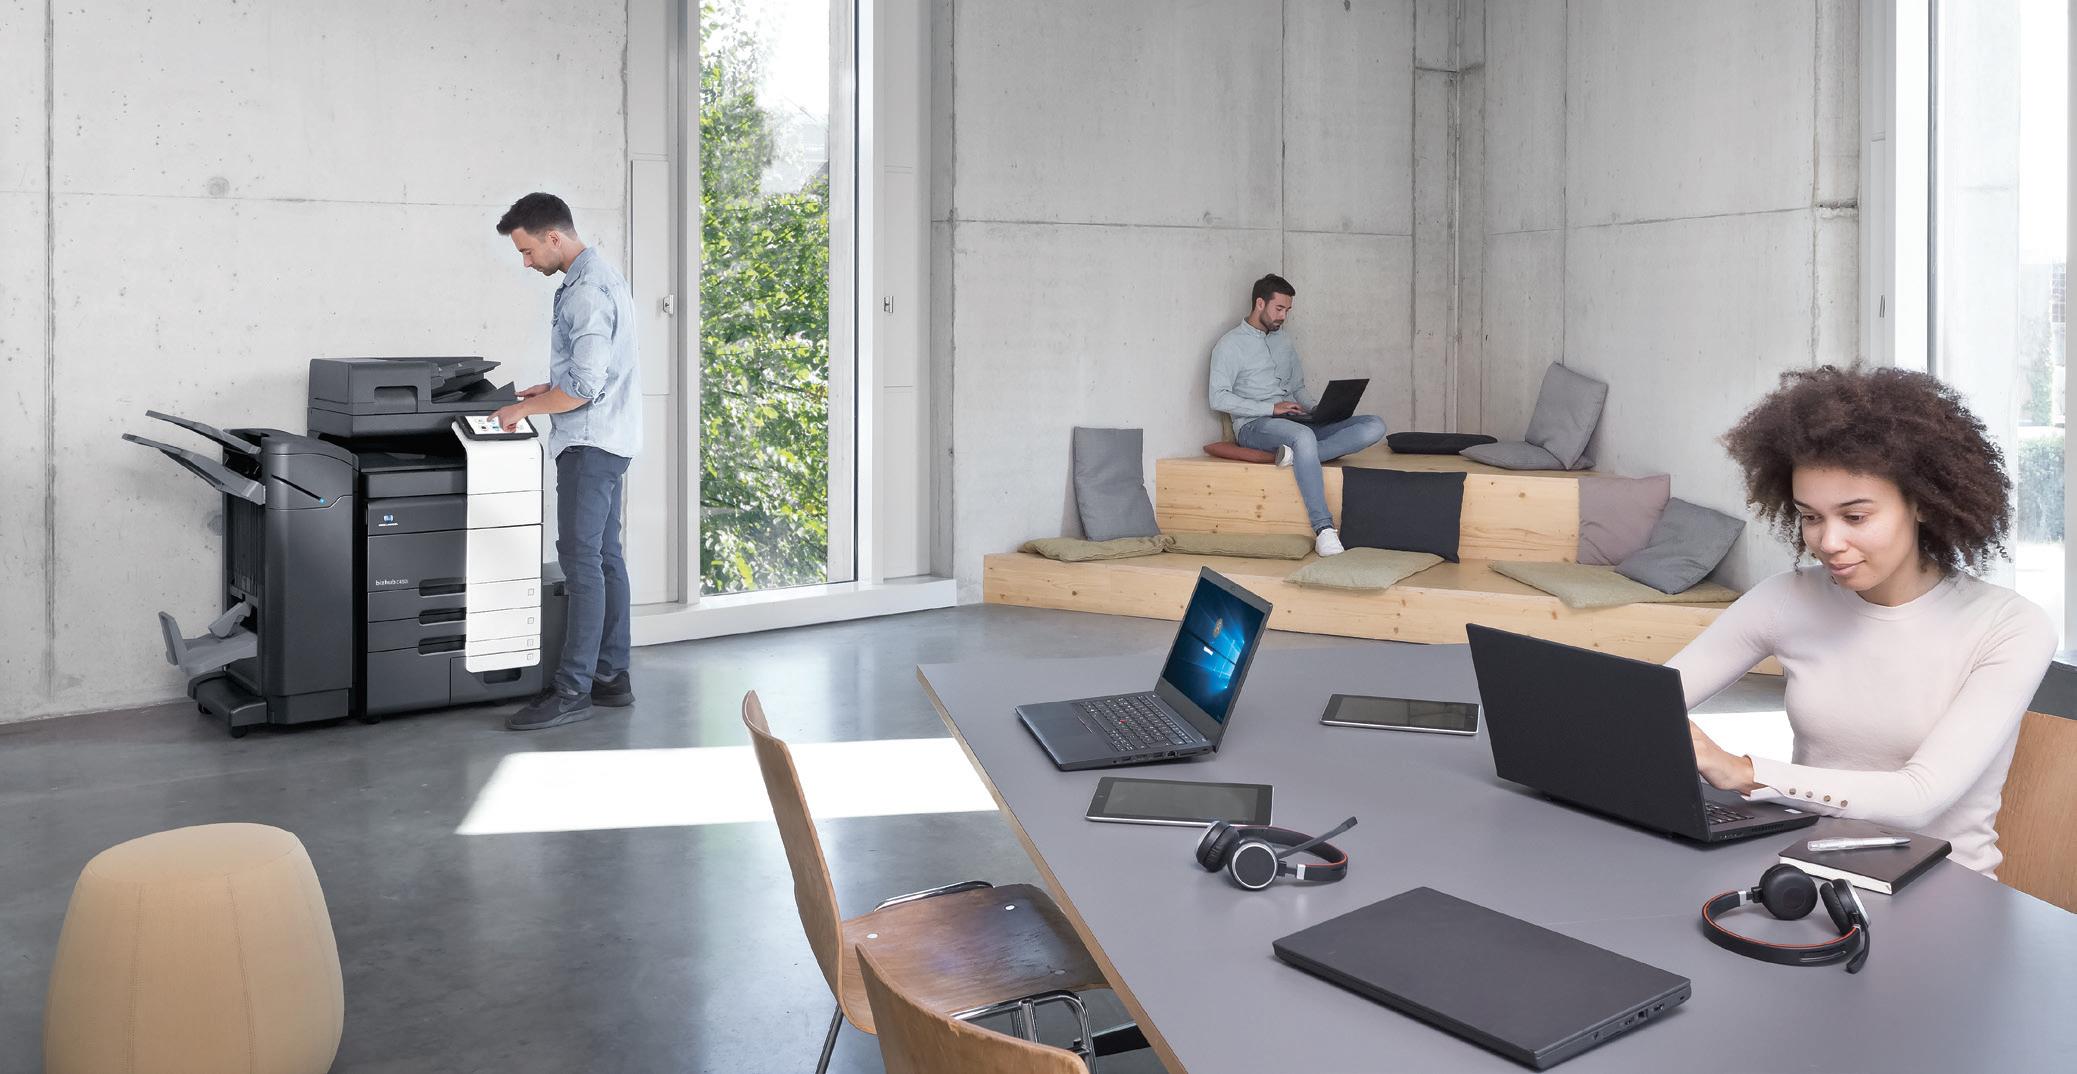 [News Release] Meridian's Konica Minolta MFPs Surpasses Industry Standards for Cybersecurity Compliance